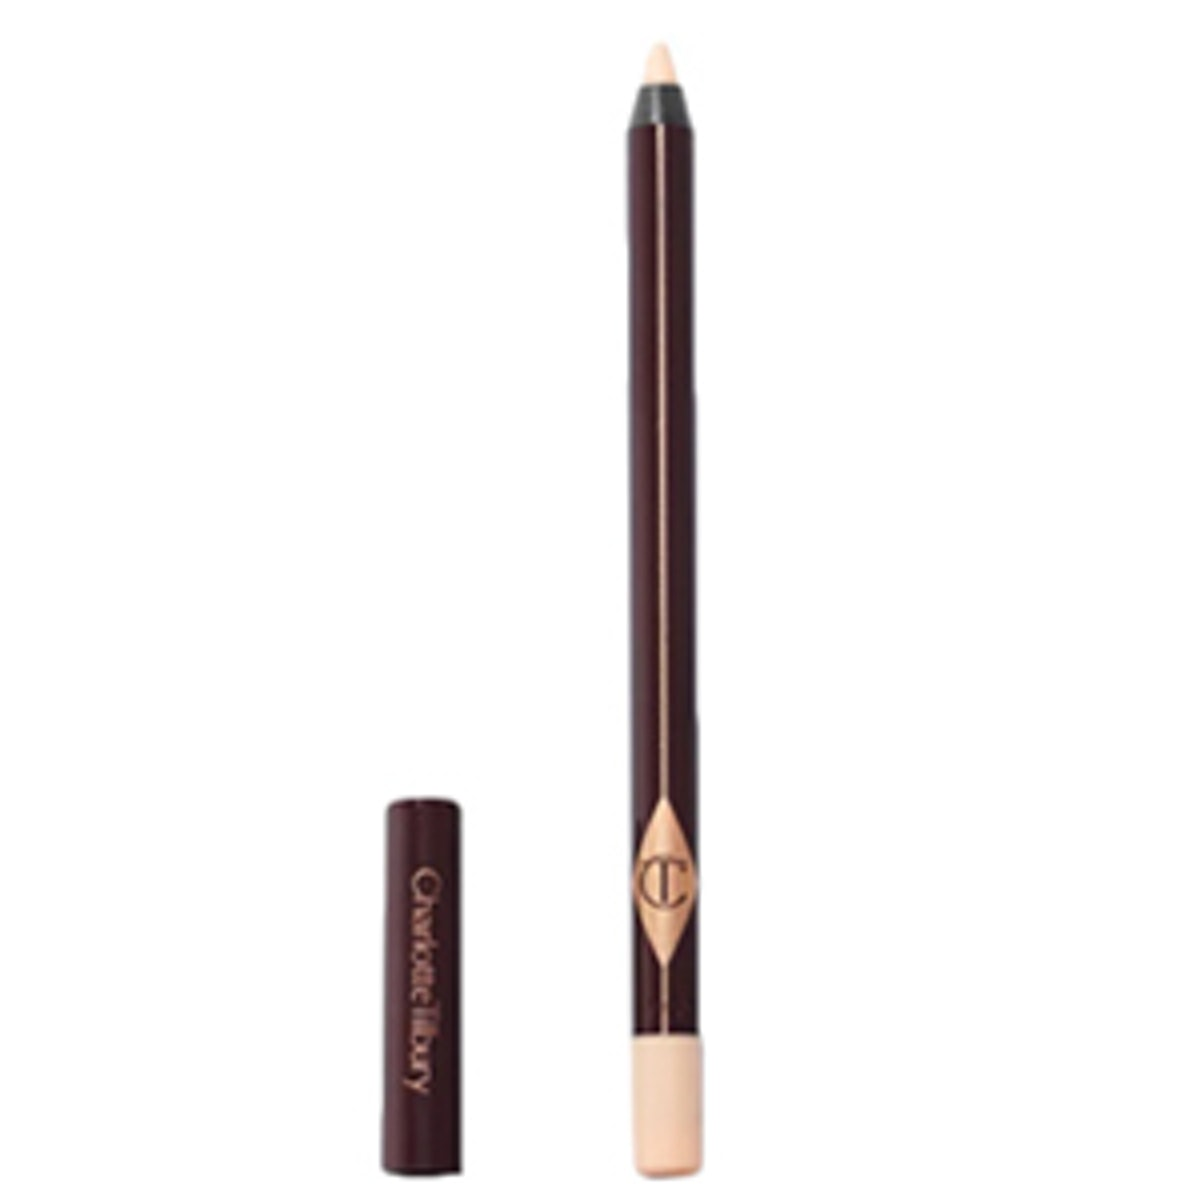 Rock 'N' Kohl Liquid Eye Pencil in Cream